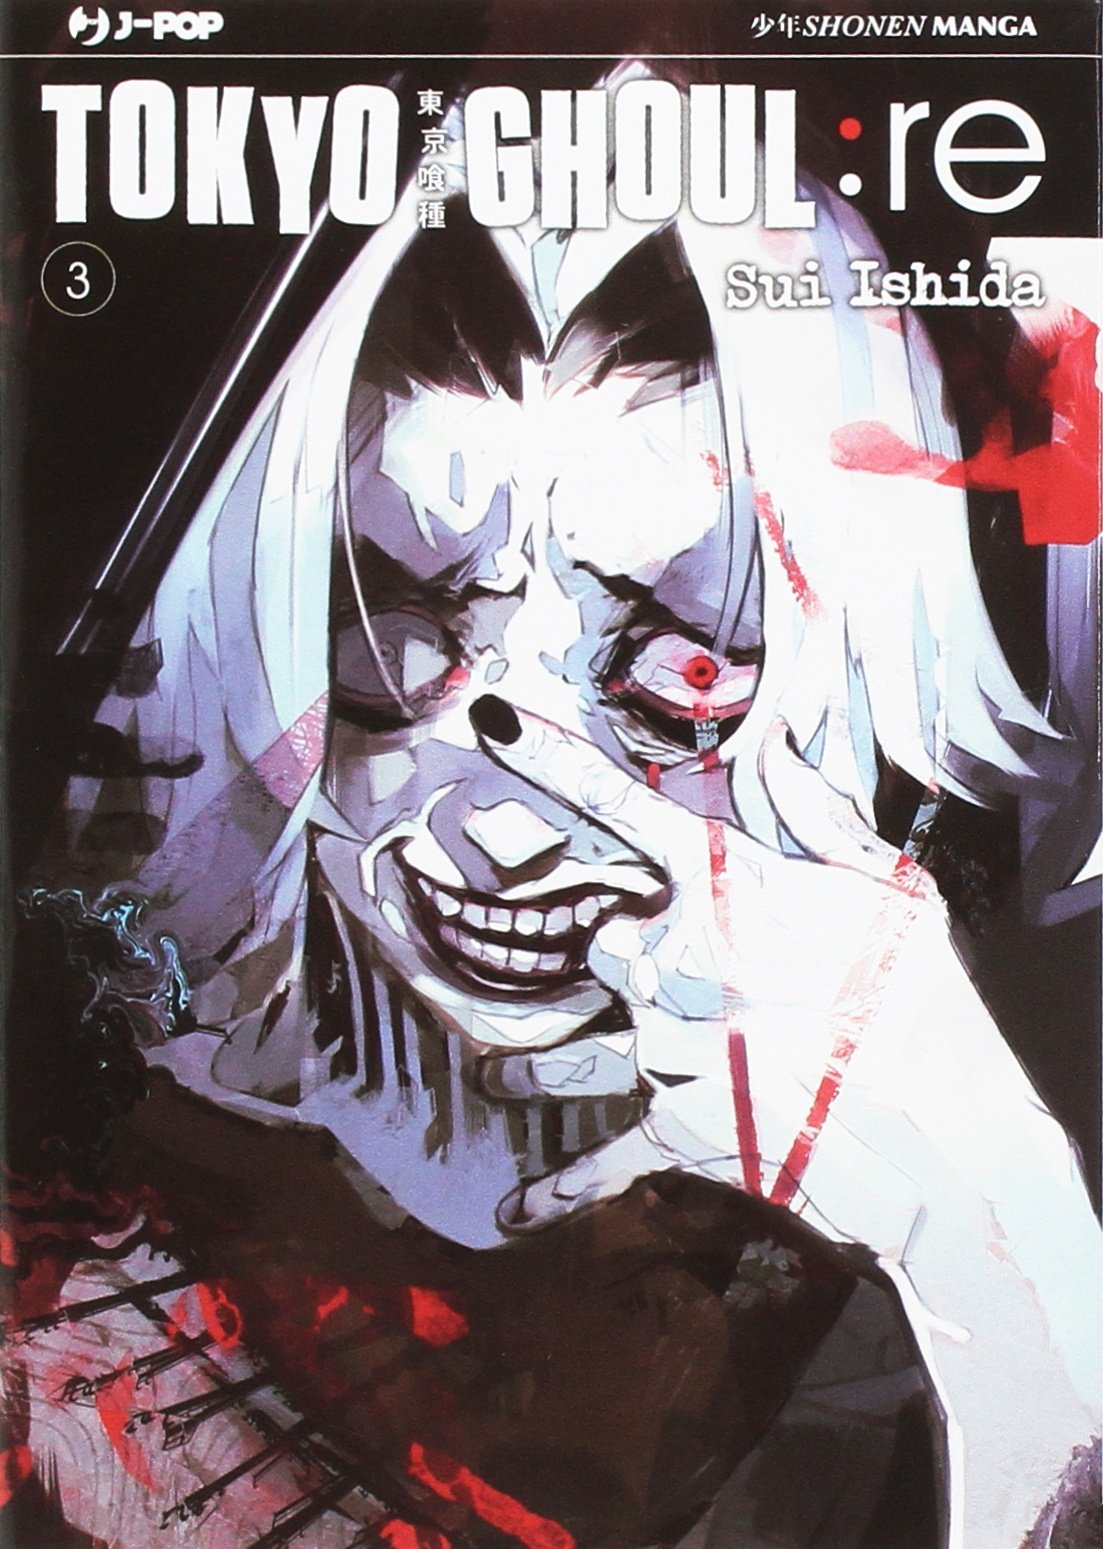 Tokyo Ghoul:re: 3 Copertina flessibile – 22 feb 2017 Sui Ishida C. Spiga Edizioni BD 8868839636